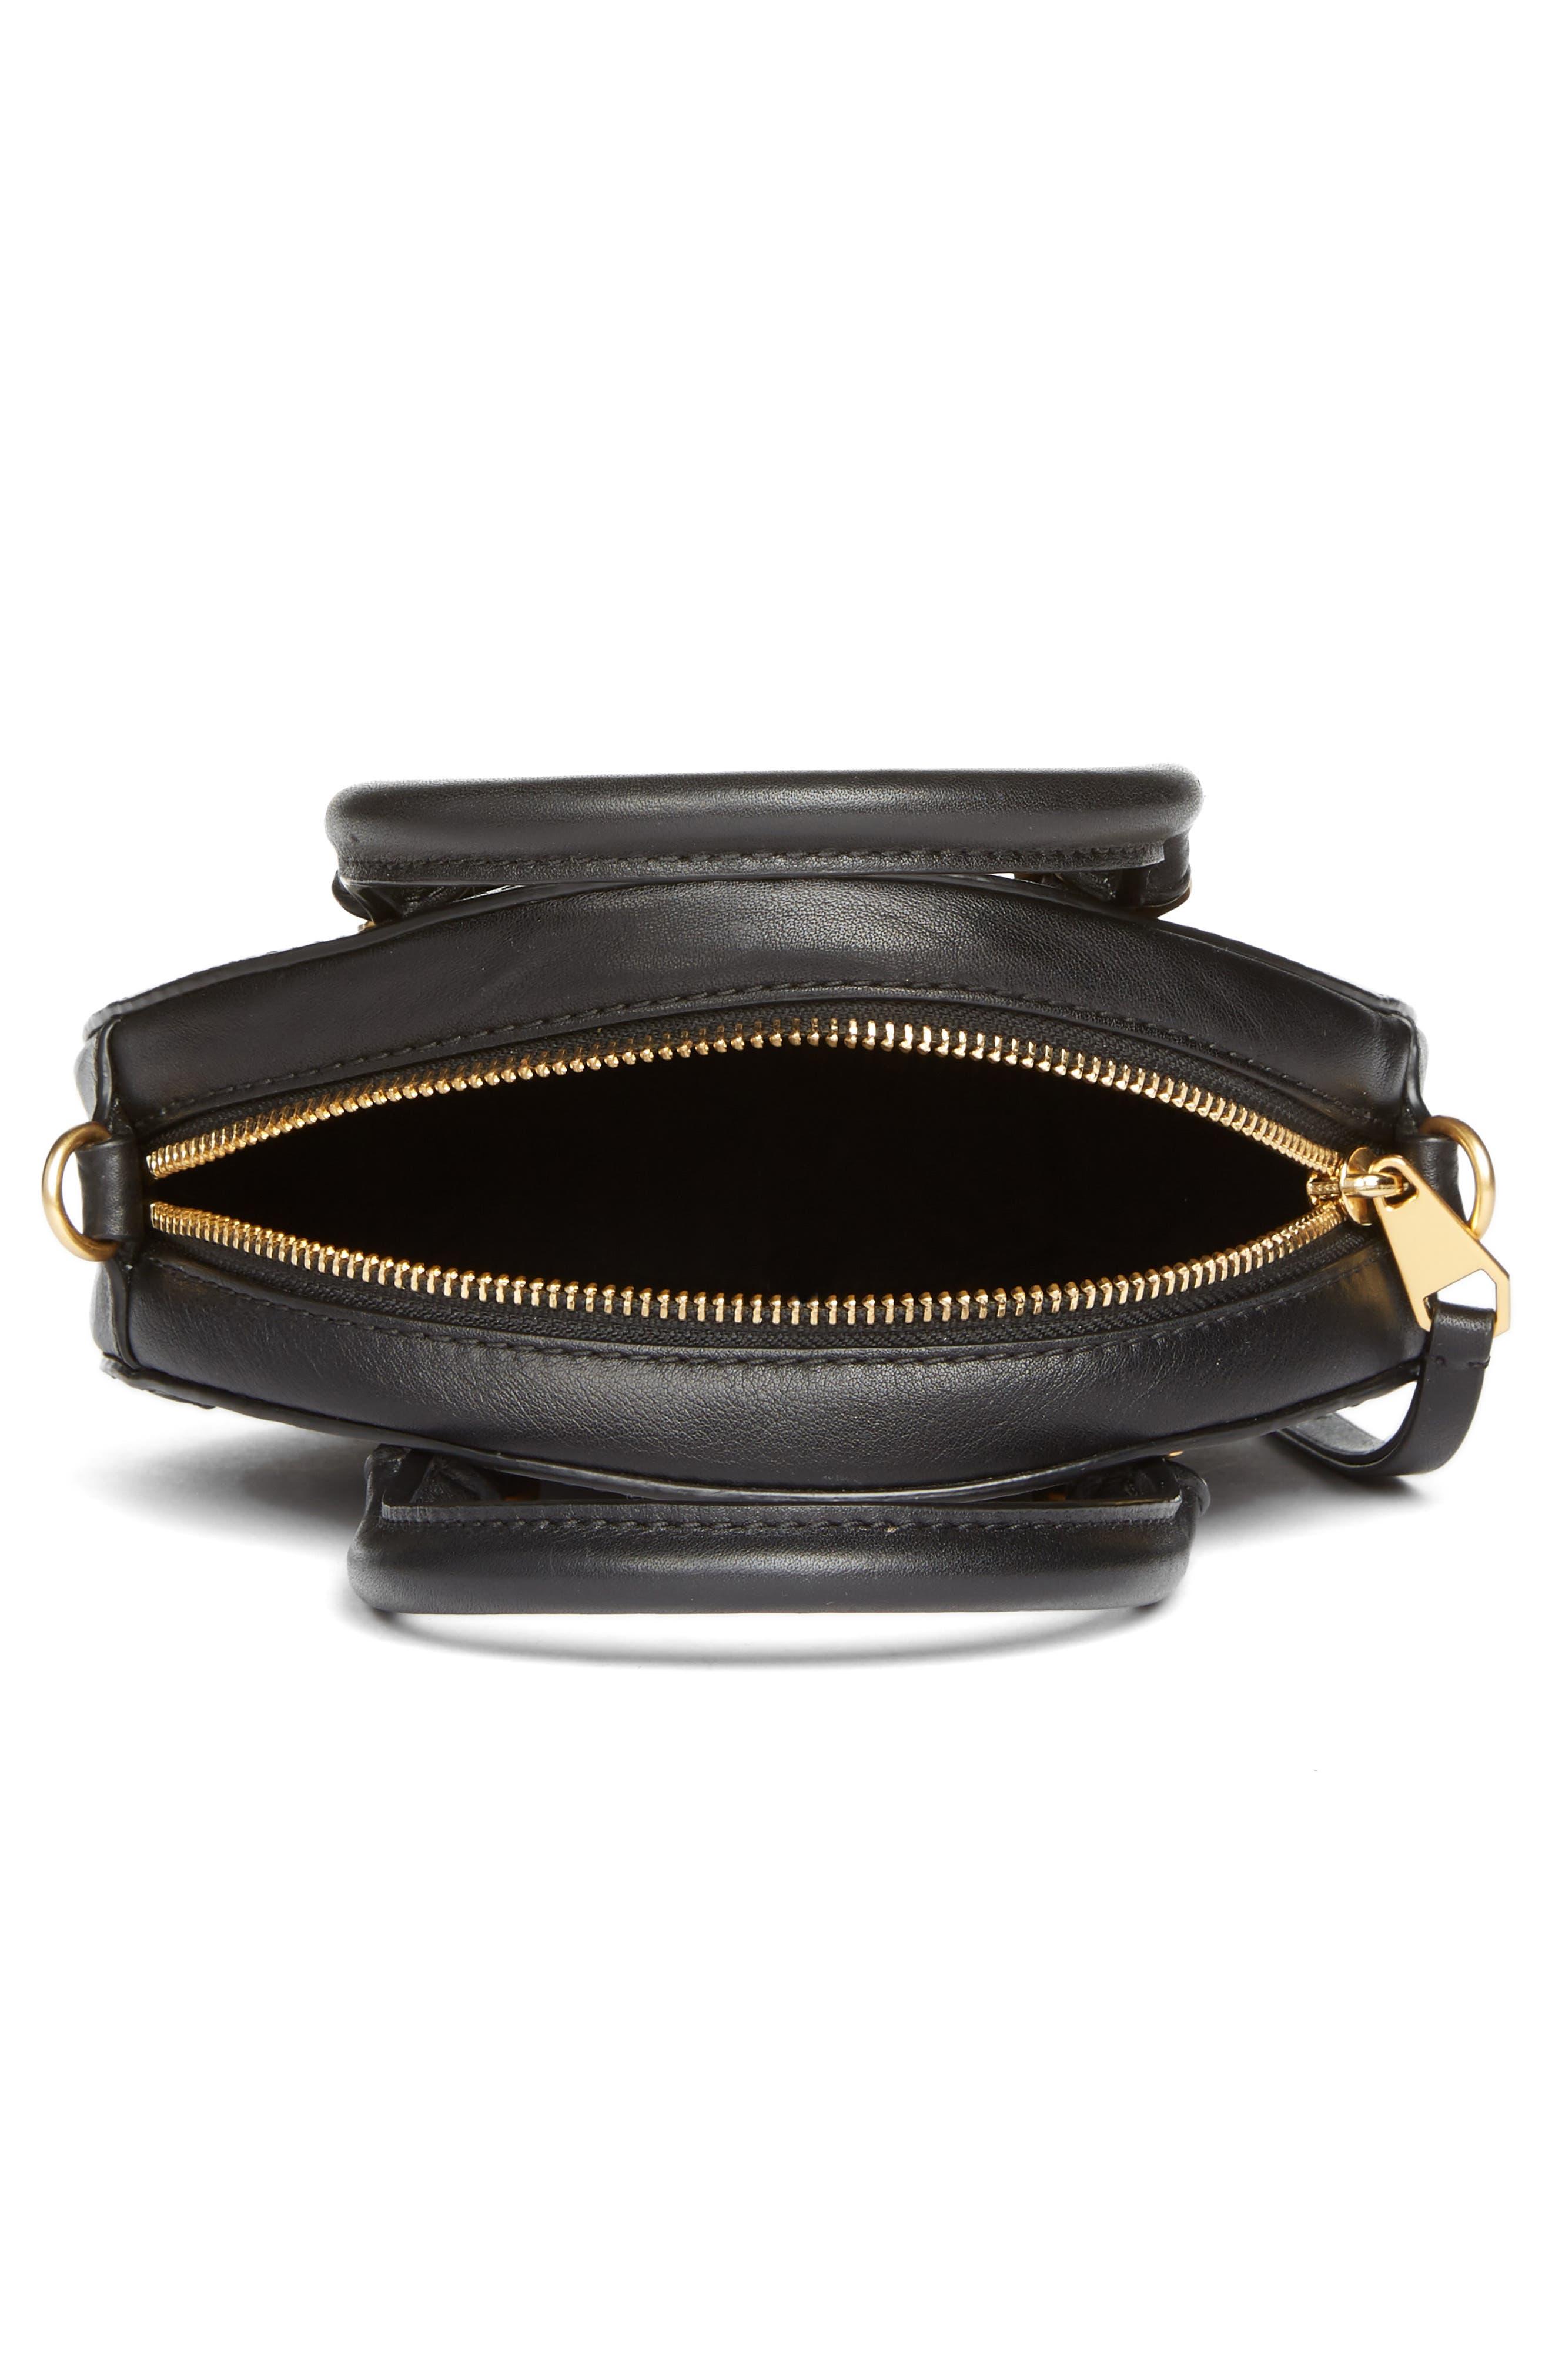 Bree Circle Leather Crossbody Bag,                             Alternate thumbnail 4, color,                             Black